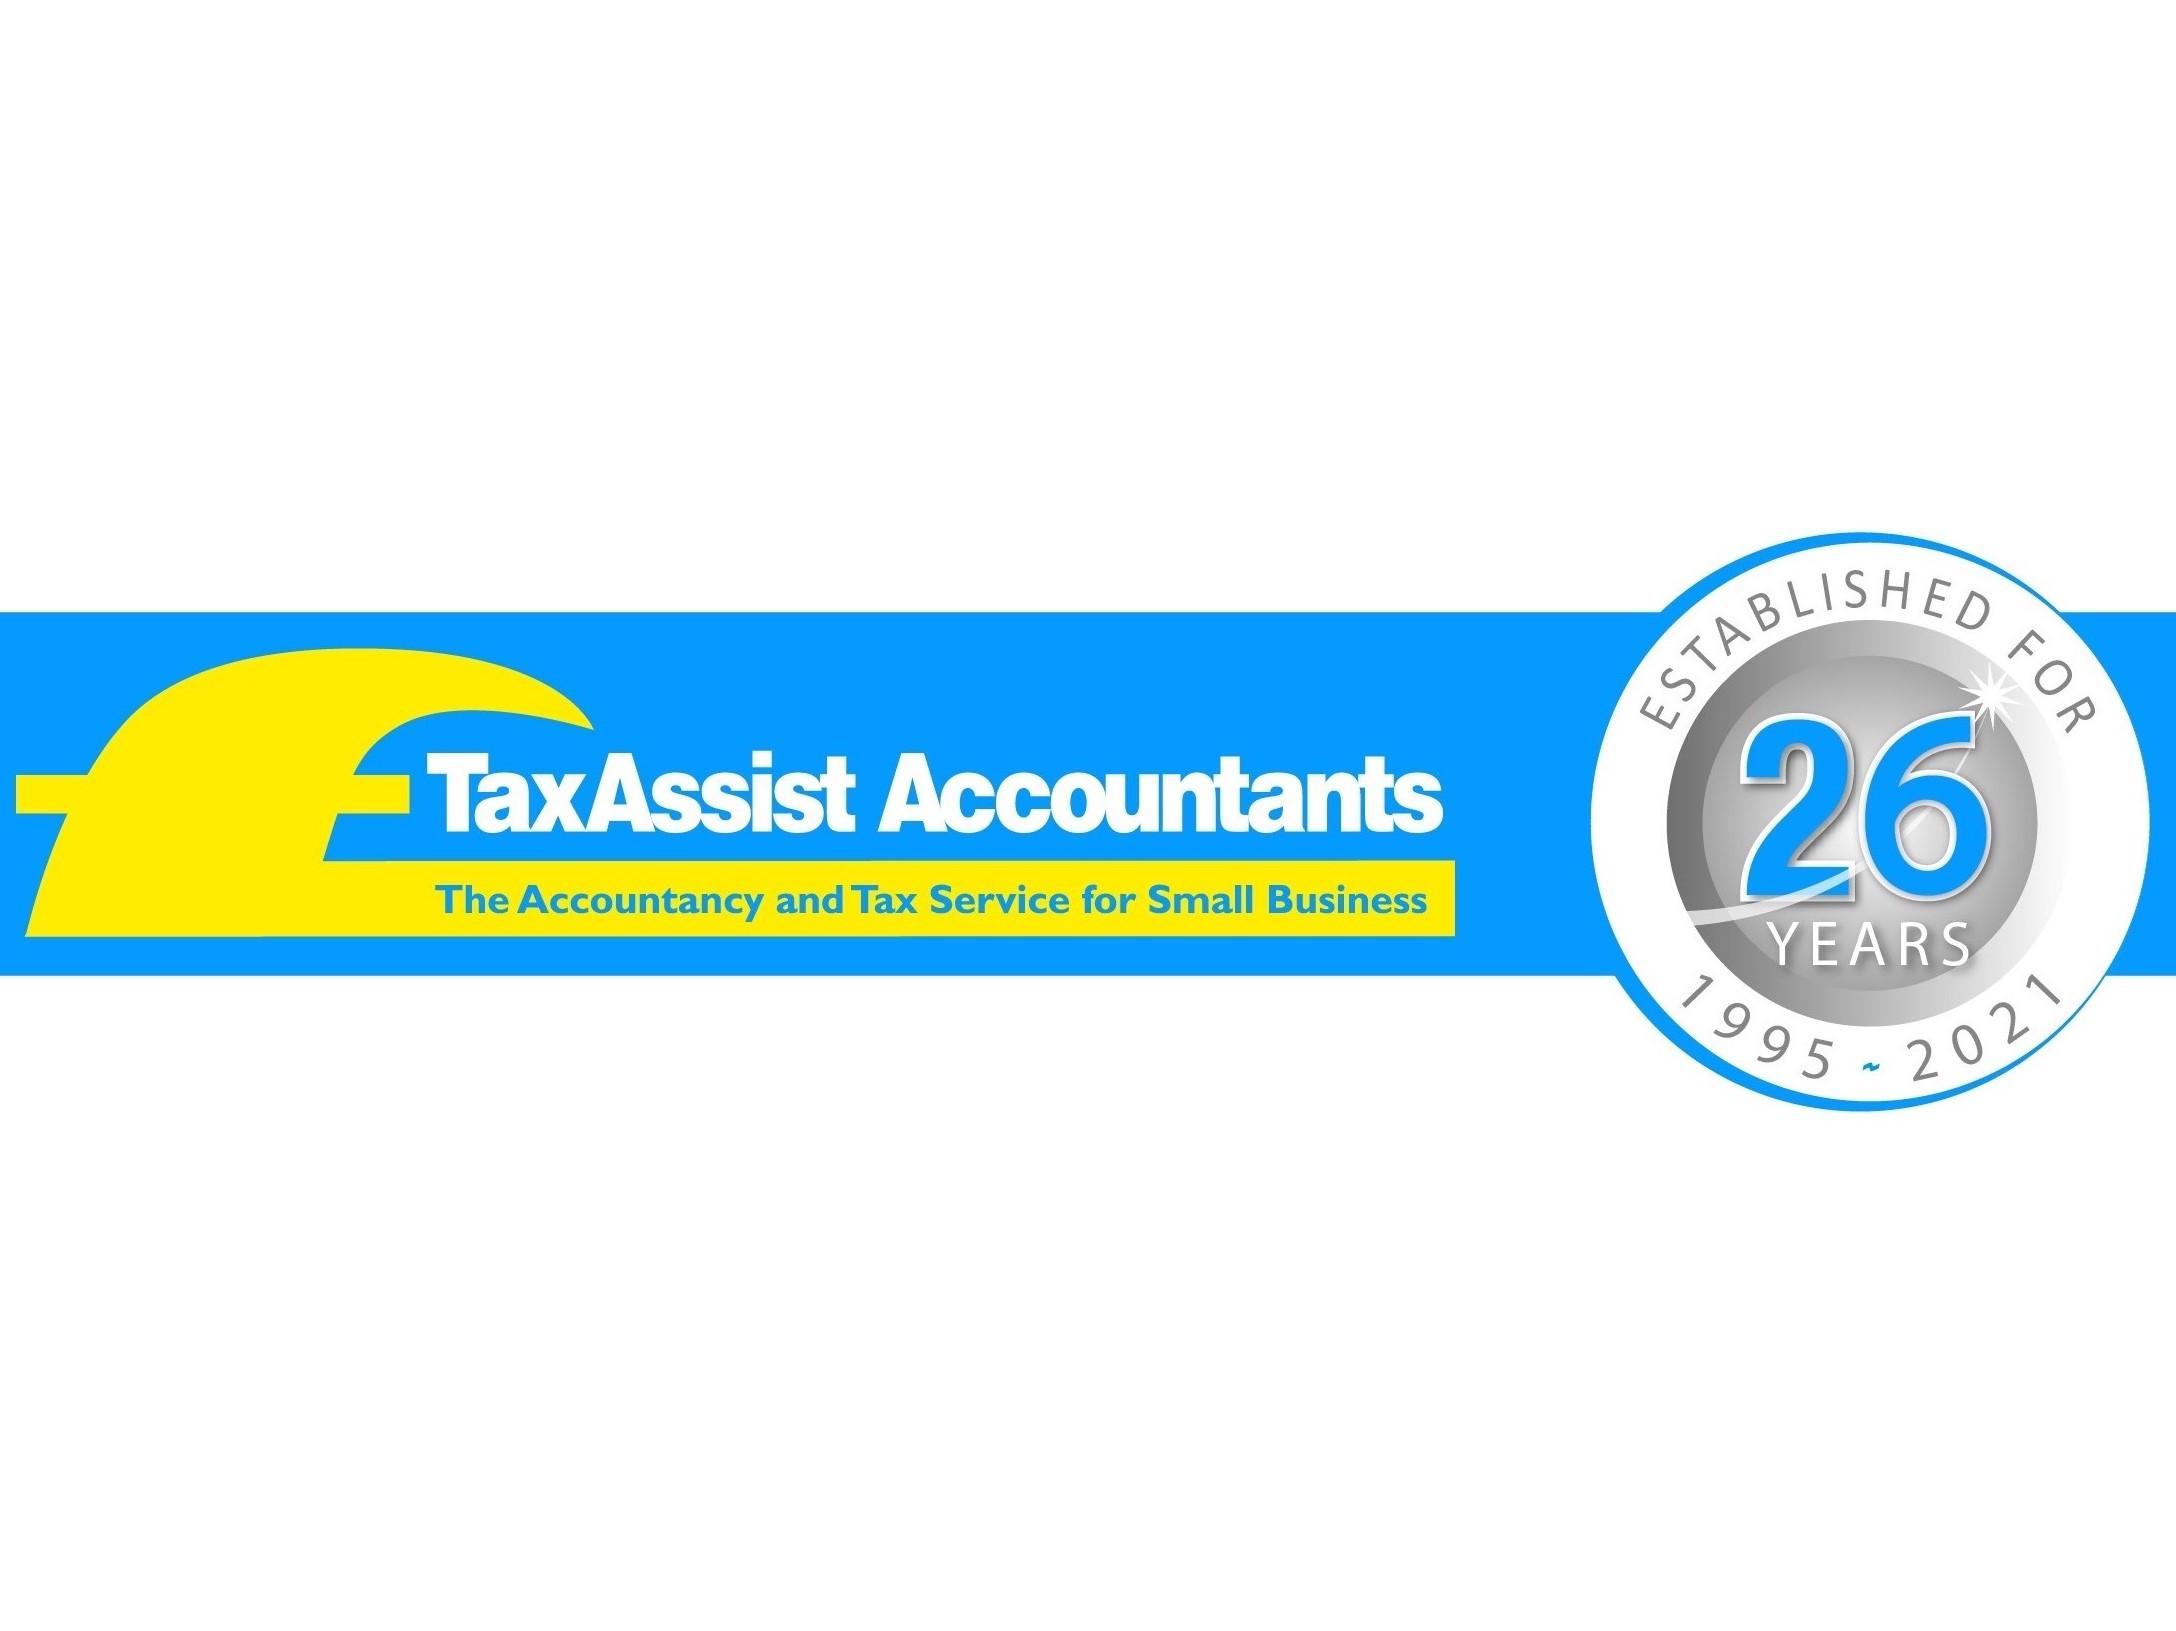 TaxAssist Accountants Caterham, Surrey logo